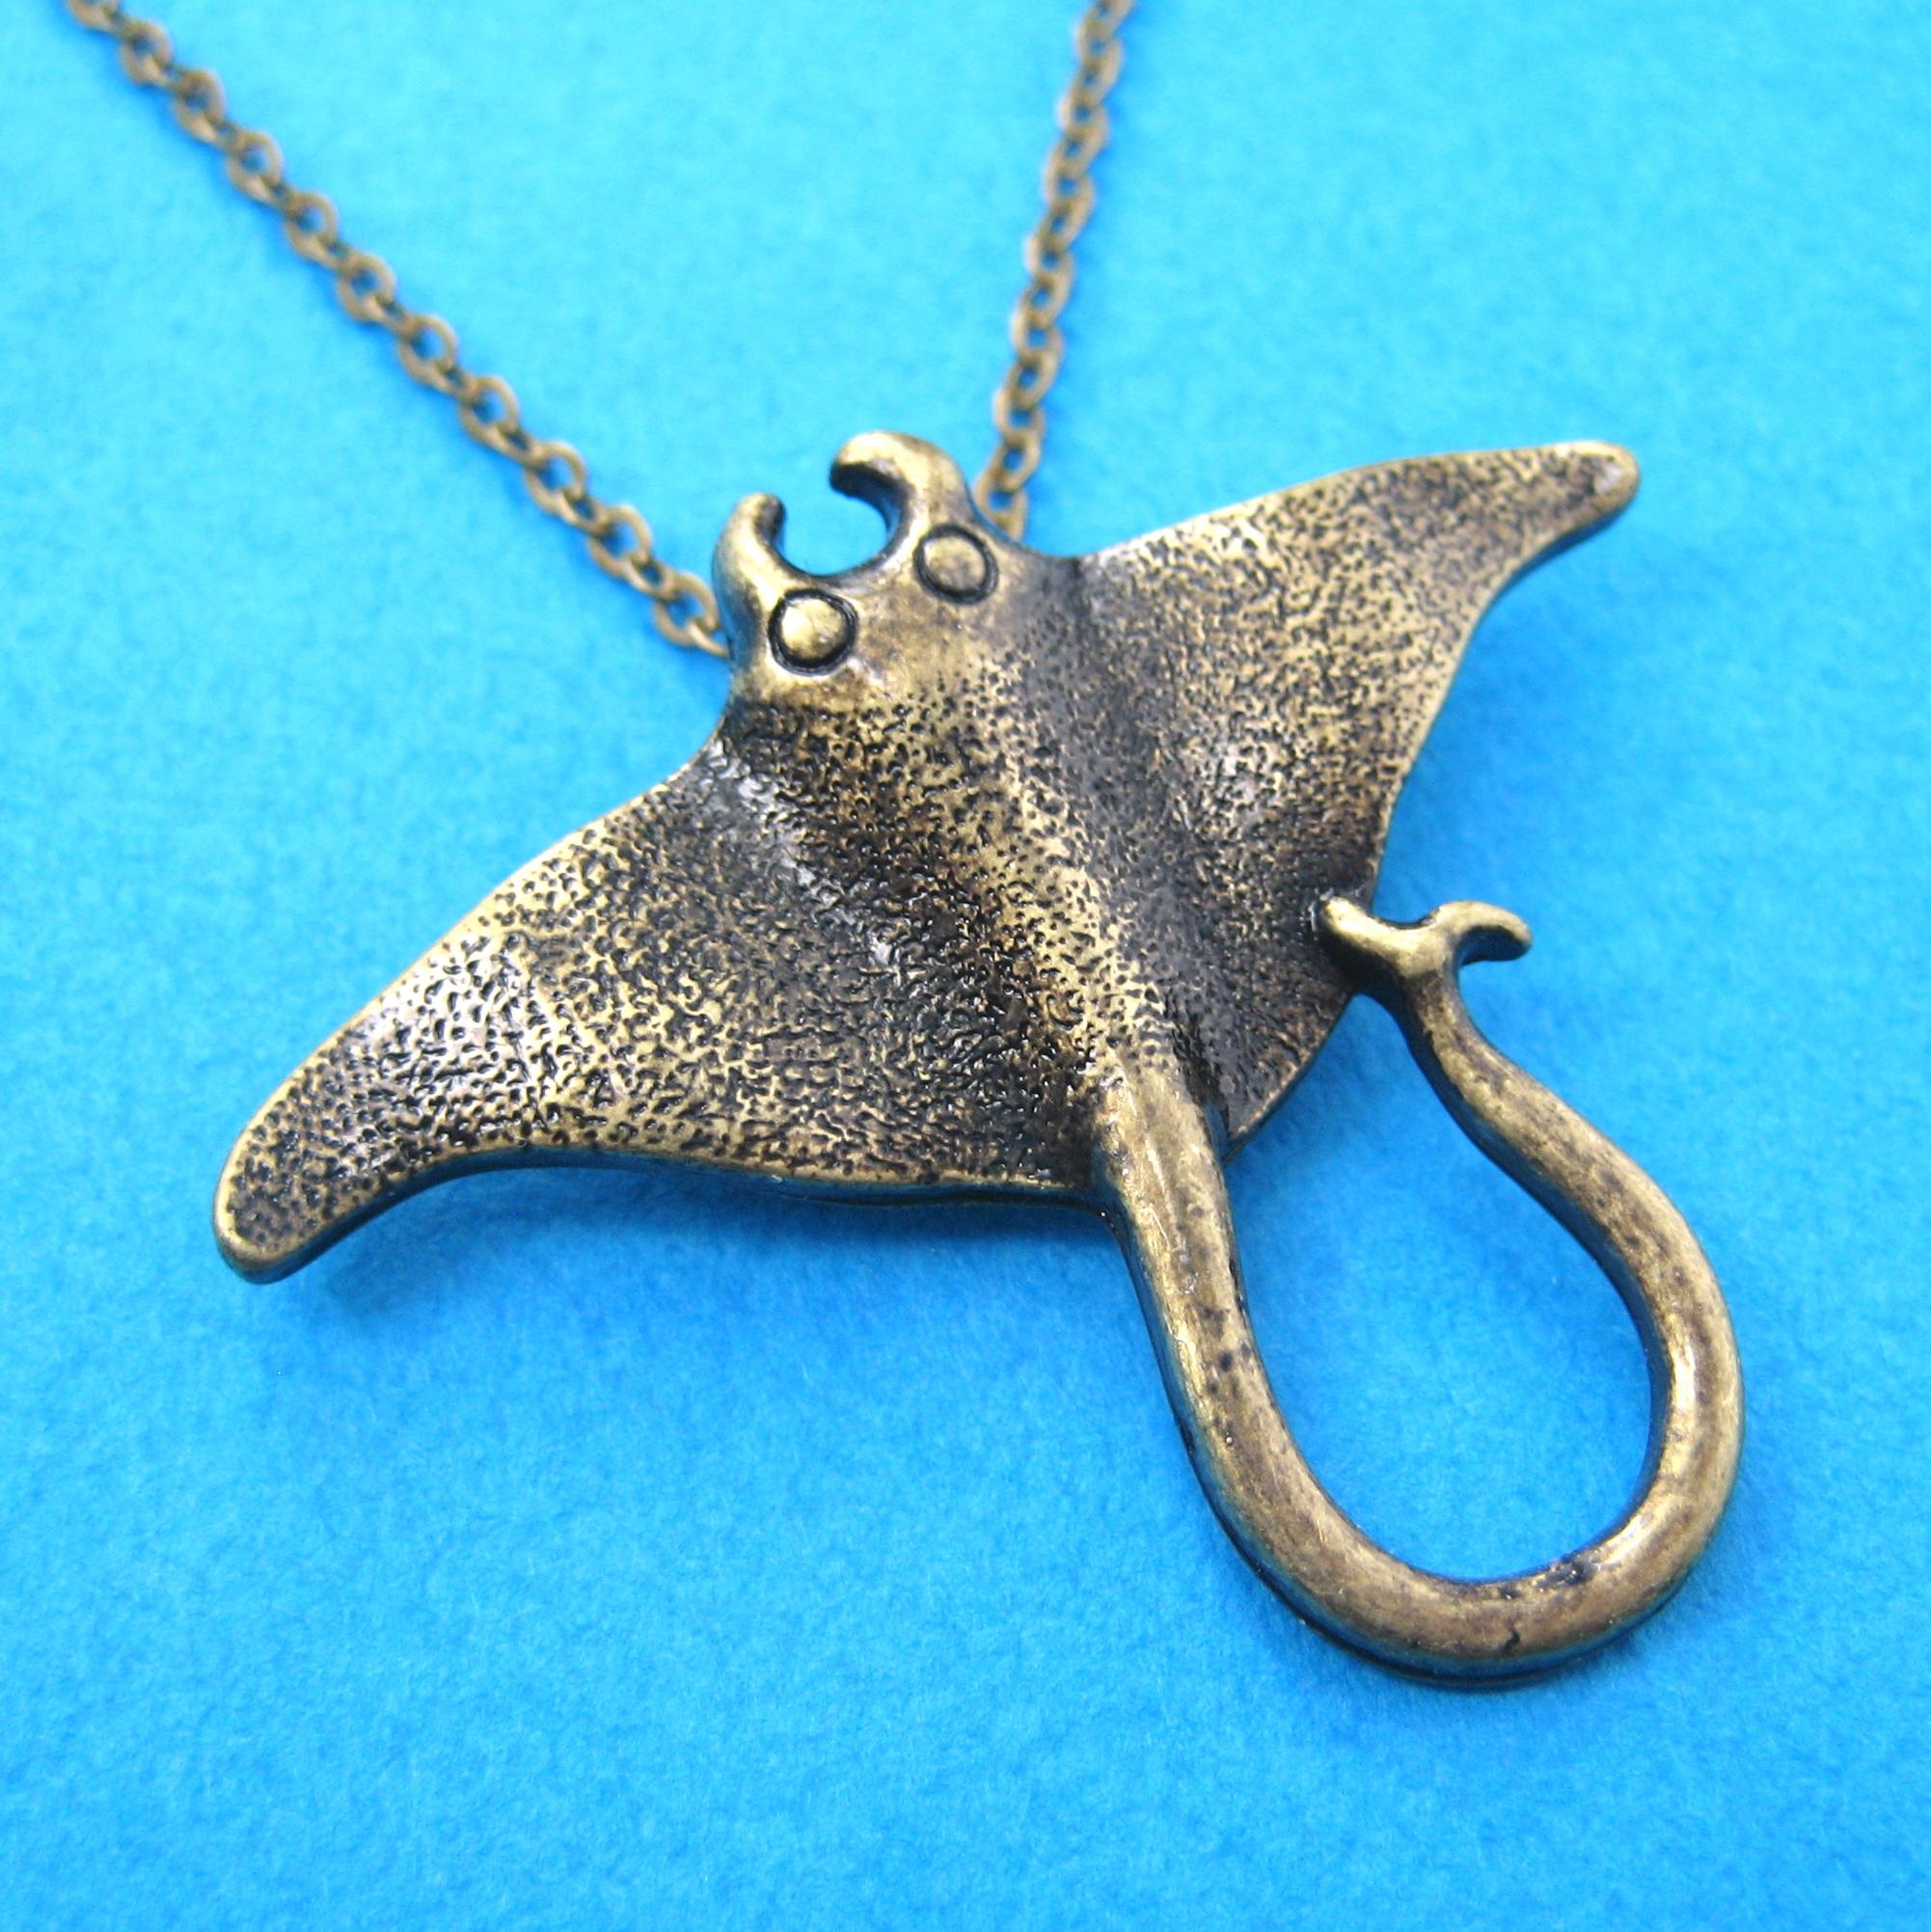 Realistic stingray sting ray sea creature animal pendant in bronze realistic stingray sting ray sea creature animal pendant in bronze aloadofball Gallery